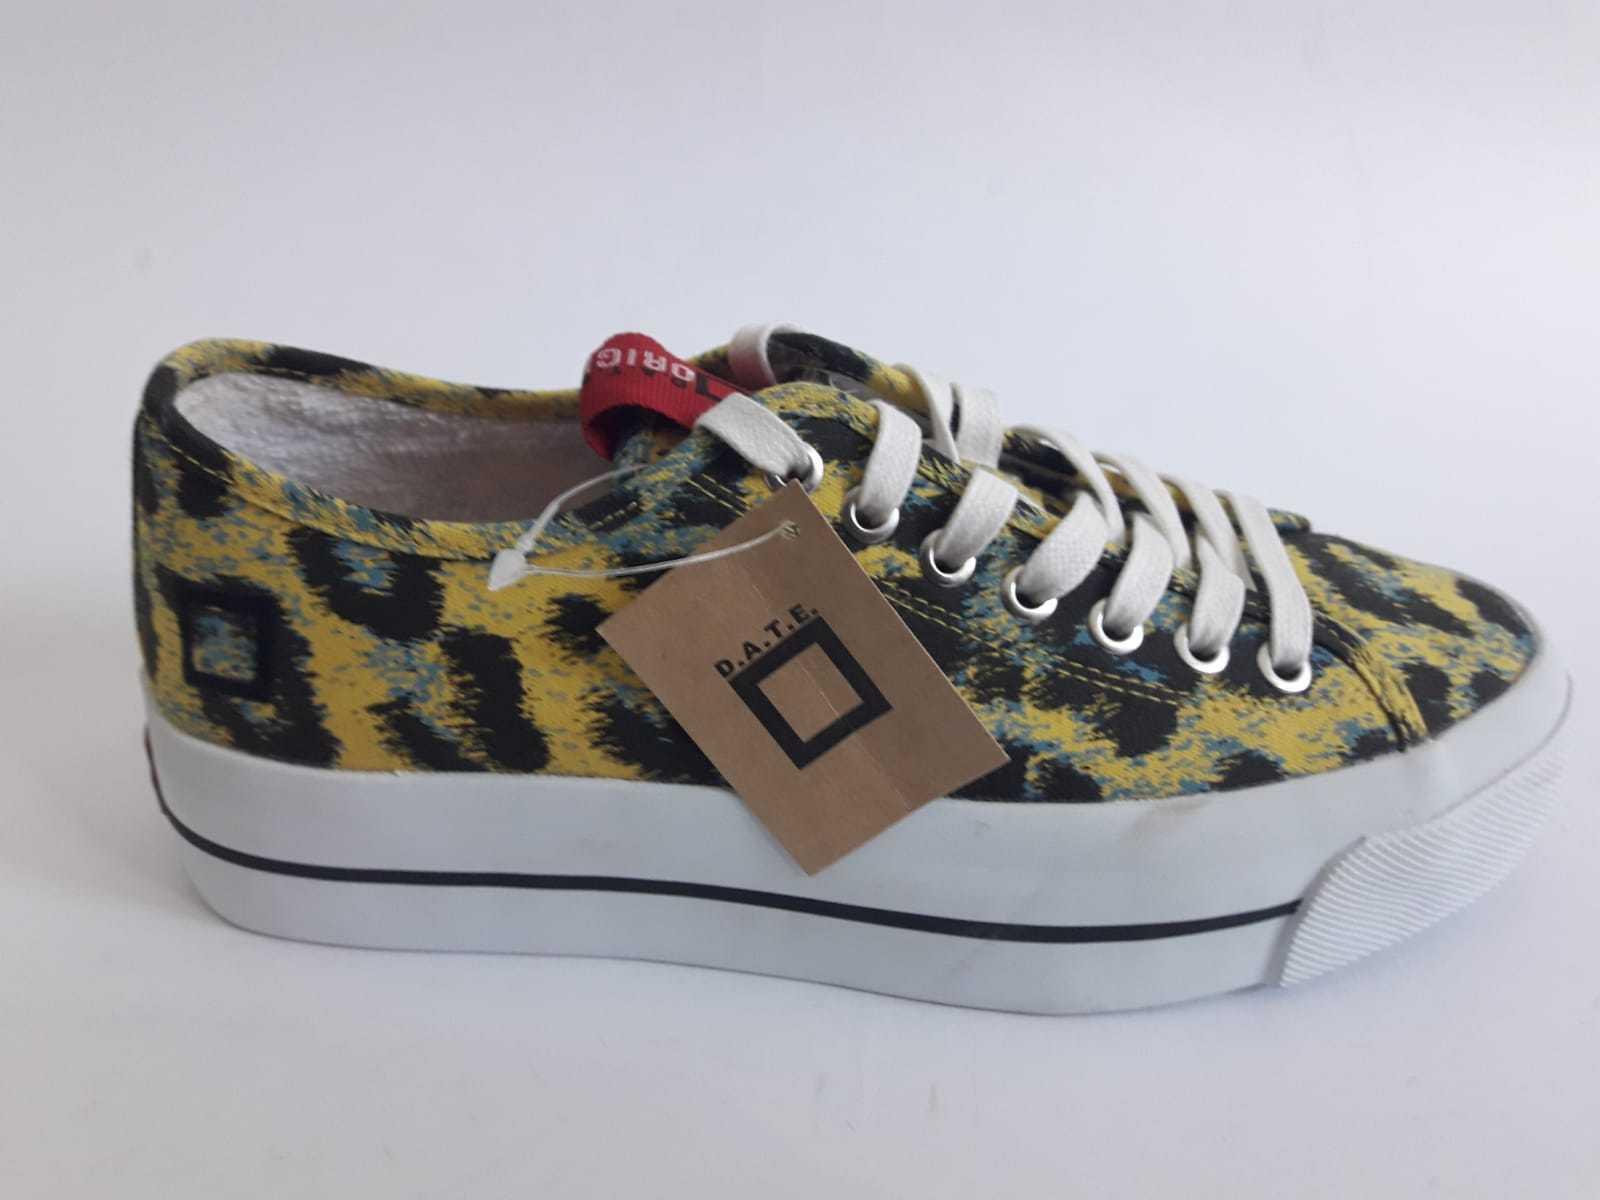 D.A.T.E. Turnschuhe Schuhe n. 38 (Vereinigtes Königreich 5 USA 7 )Frau  | Genial Und Praktisch